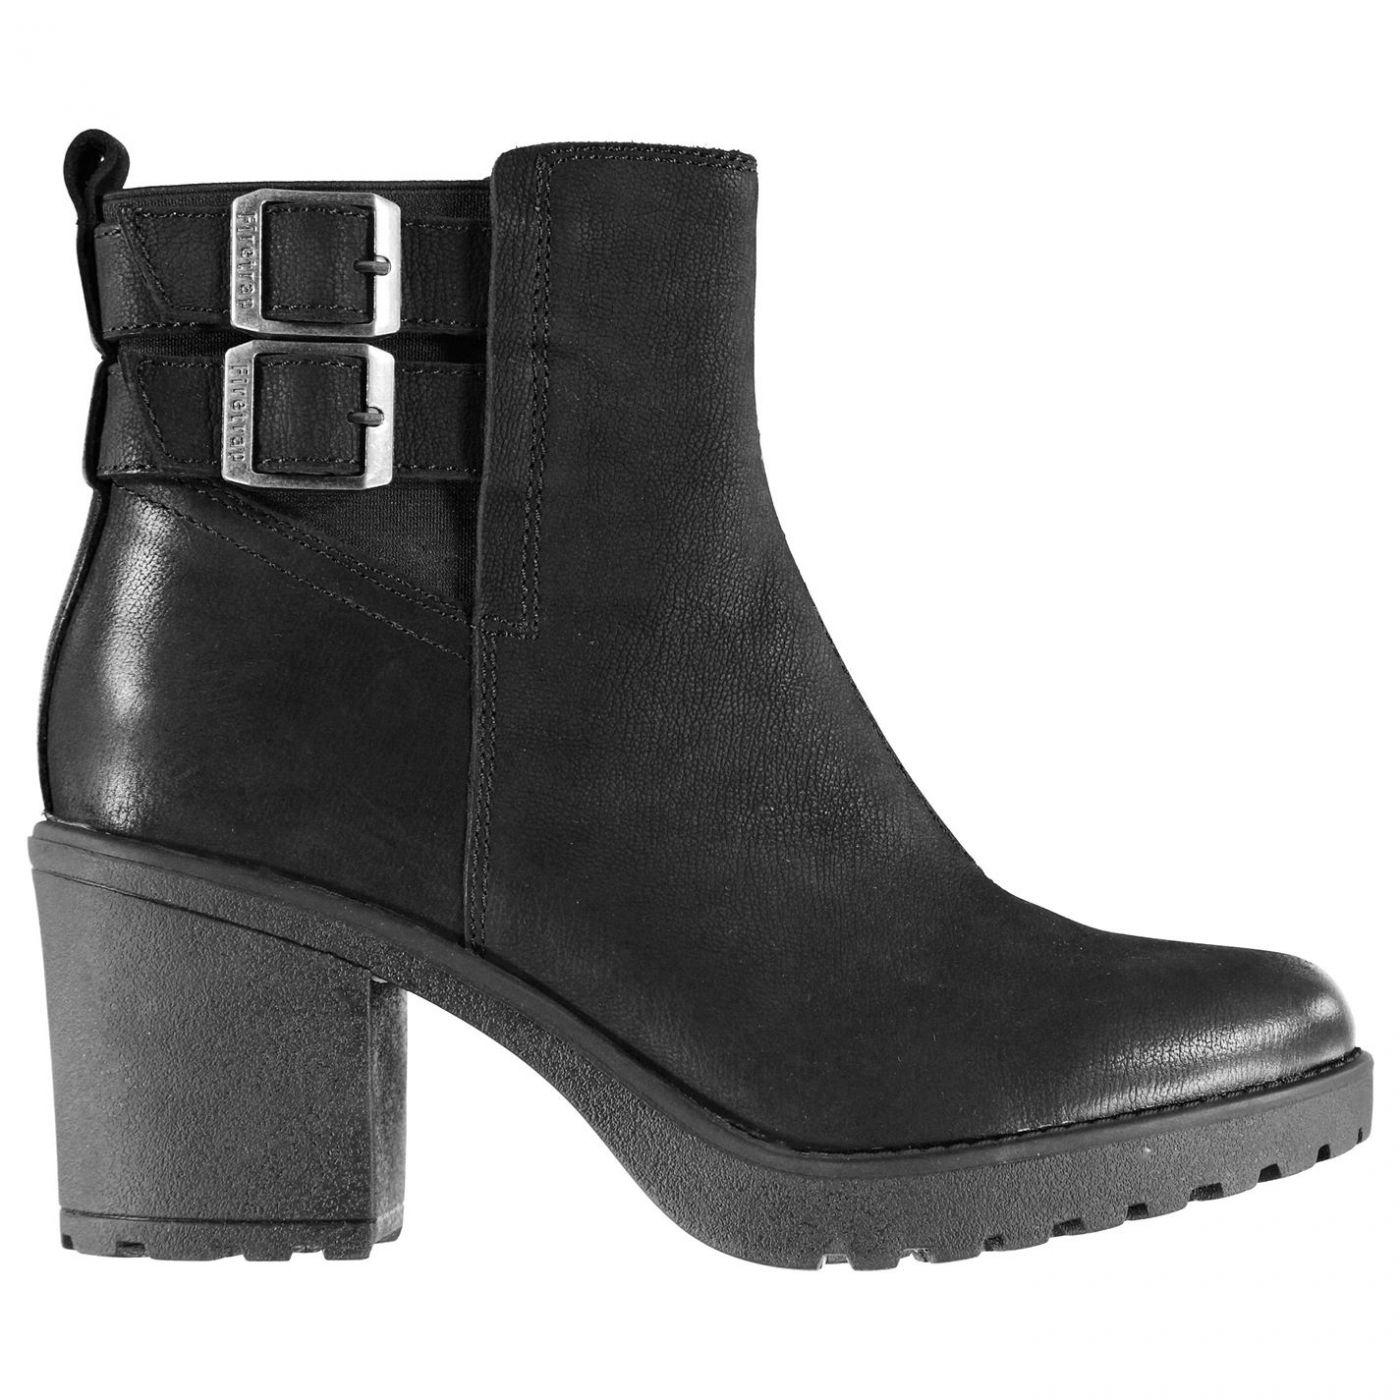 Firetrap Atom Ladies Ankle Boots